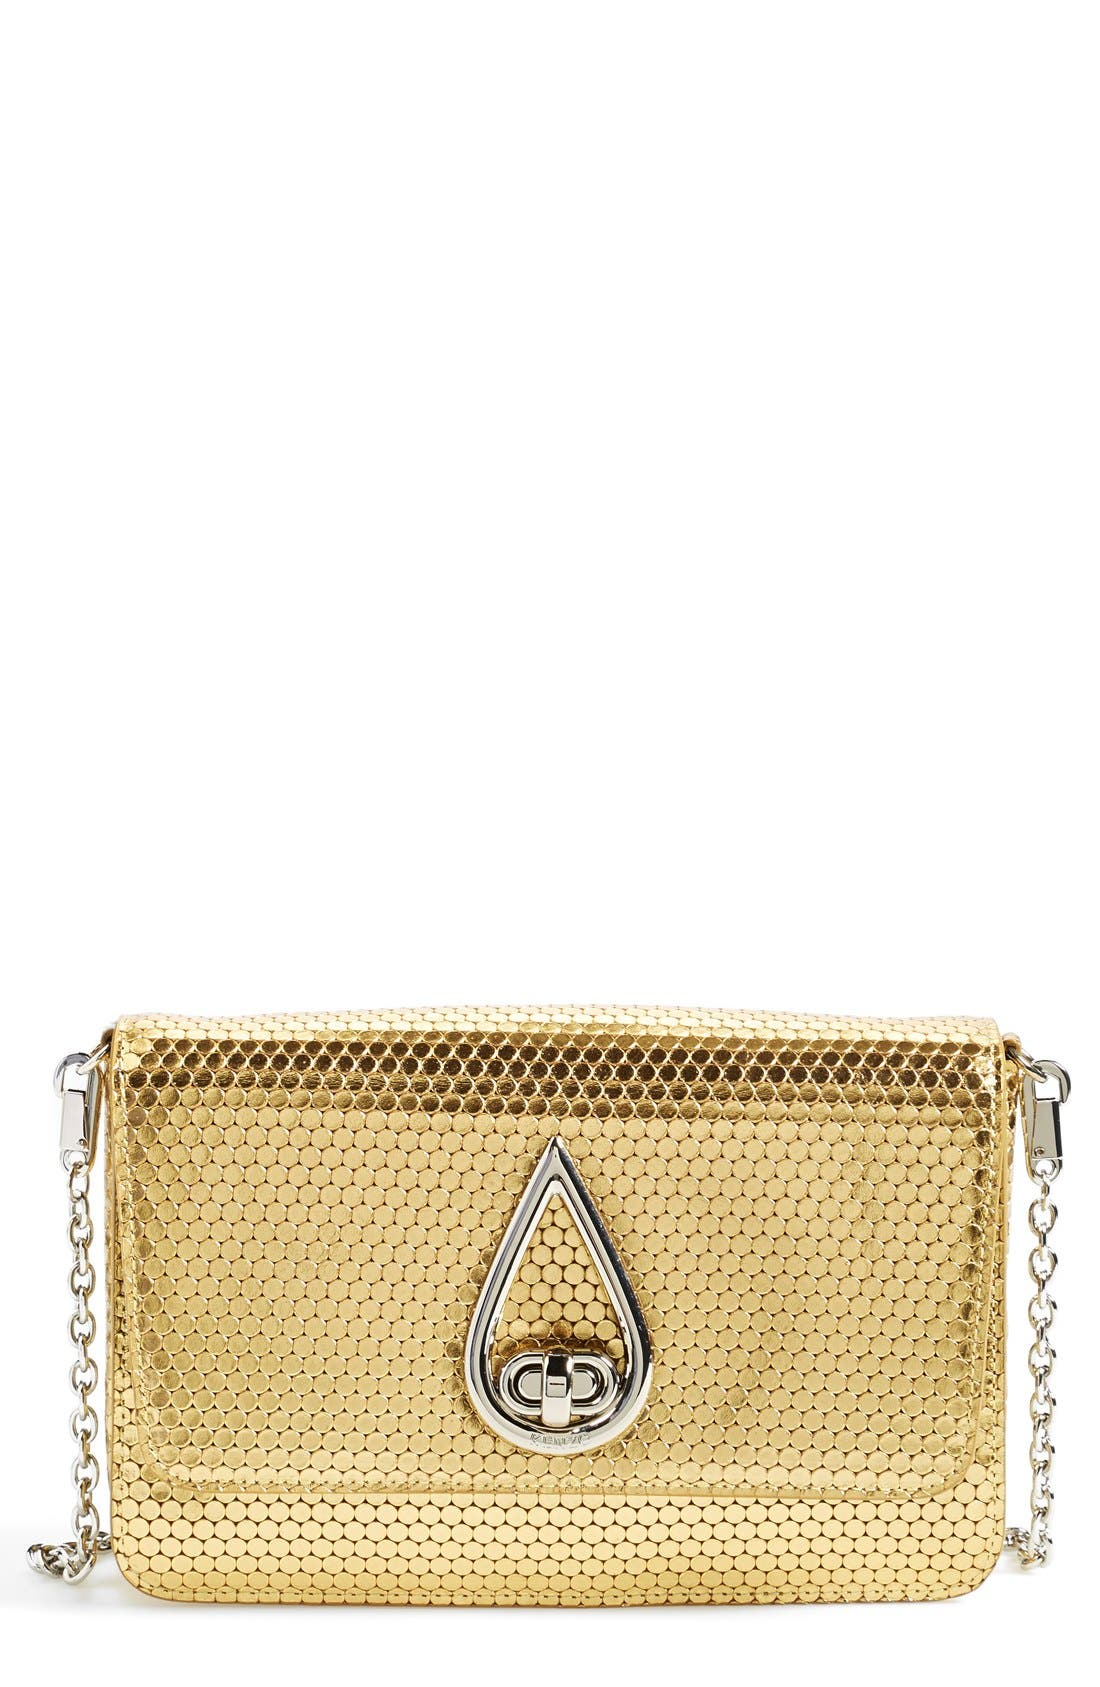 Main Image - KENZO 'Raindrop' Metallic Leather Shoulder Bag